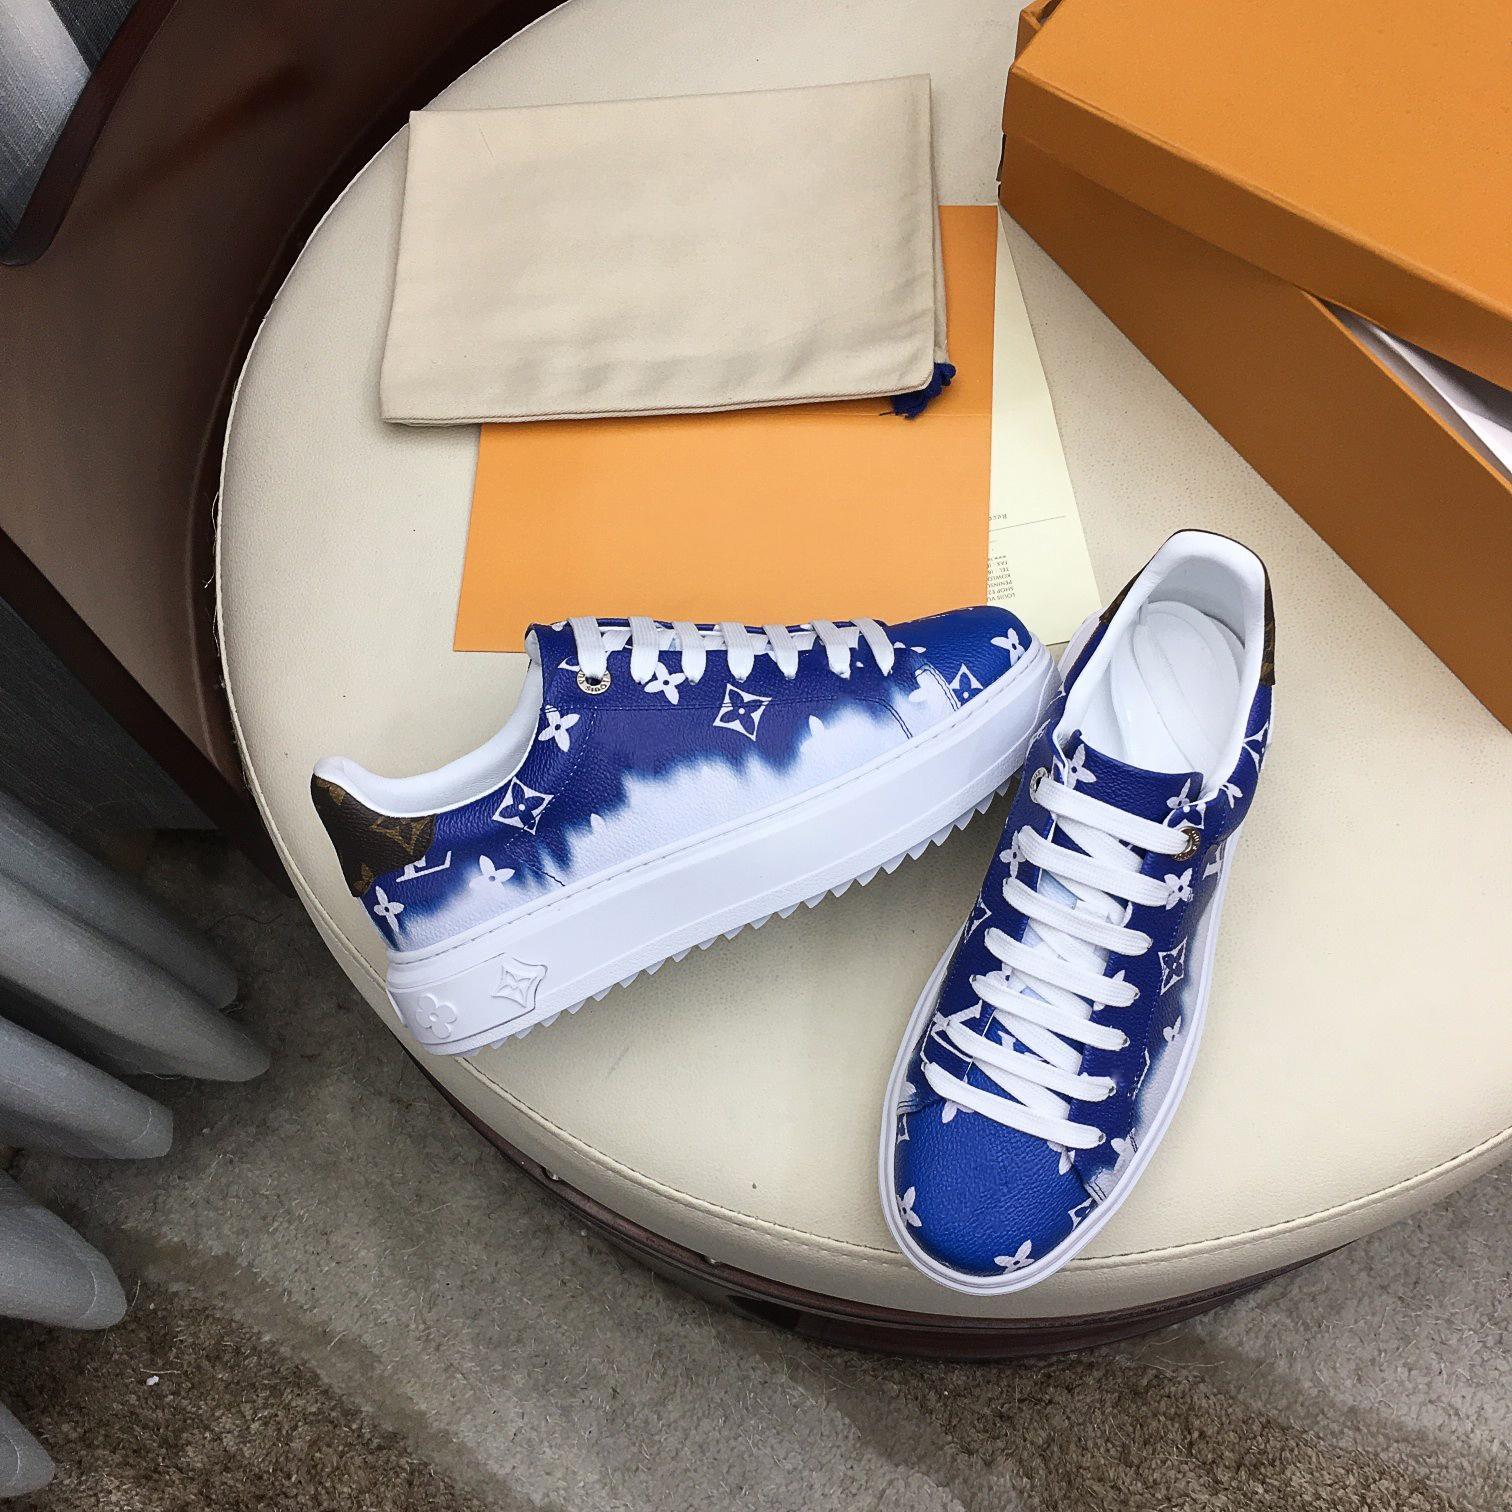 "GG""LV""louis…vitton&#;132;Ysl…vutton luxury brand designer shoes"